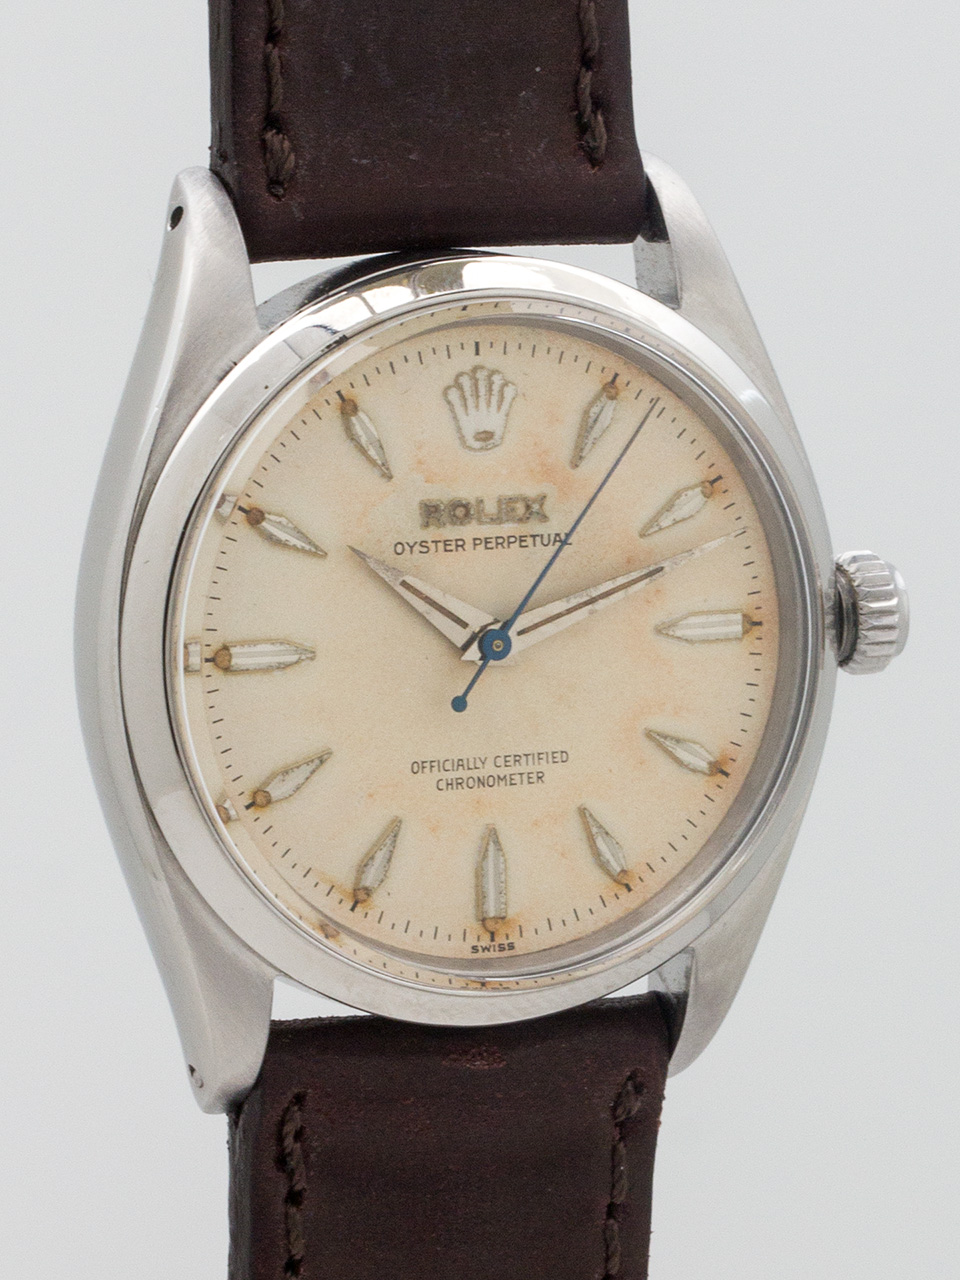 Rolex Oyster Perpetual ref 6564 Original Dial circa 1959